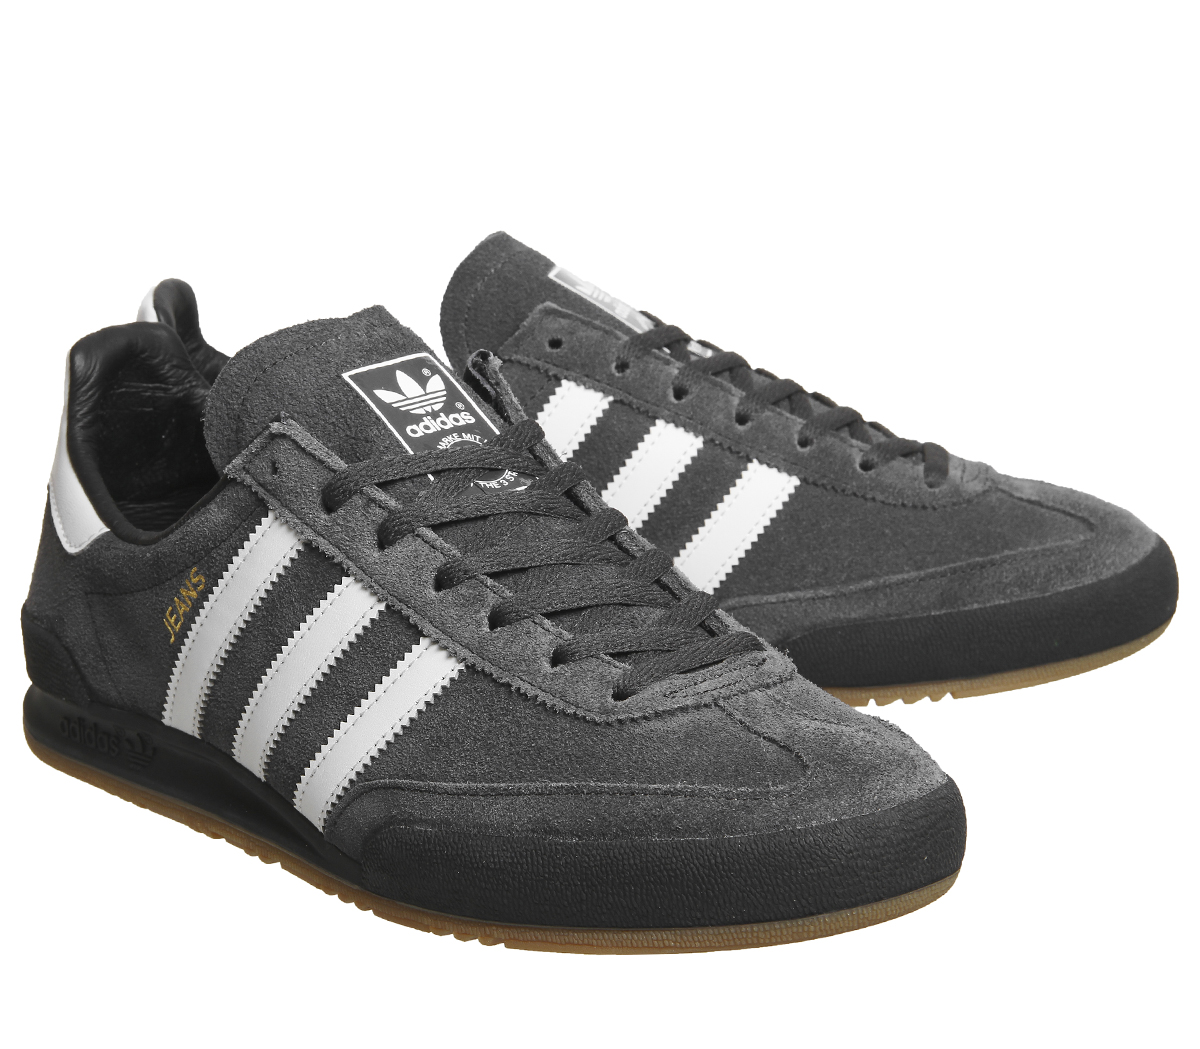 Details zu Adidas Jeans Turnschuhe Carbon Grau One Turnschuhe